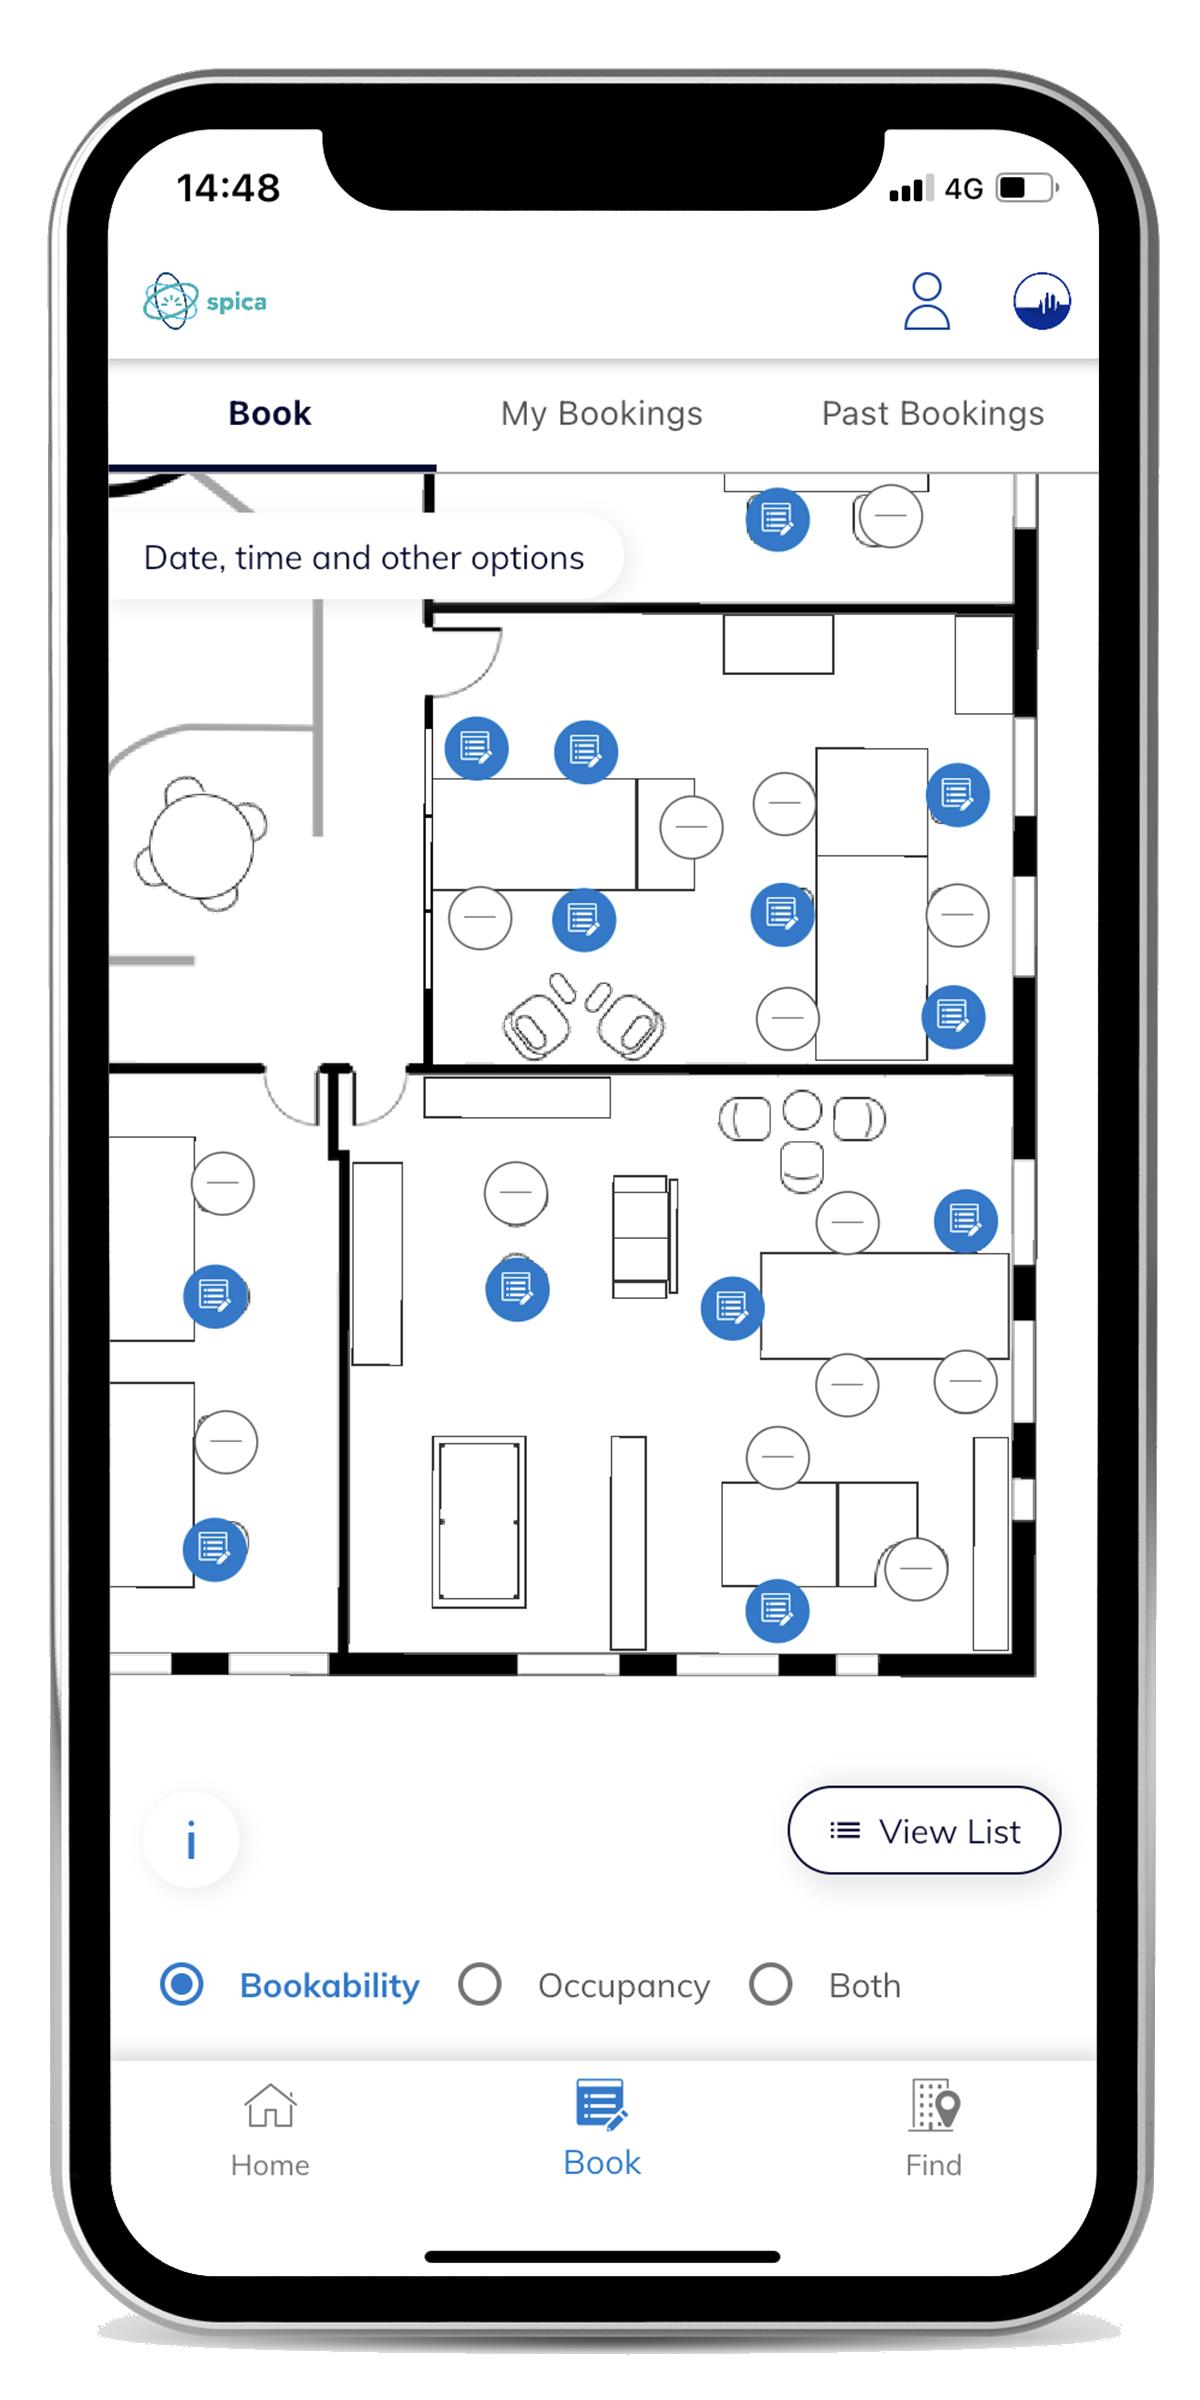 Book Module - Map View